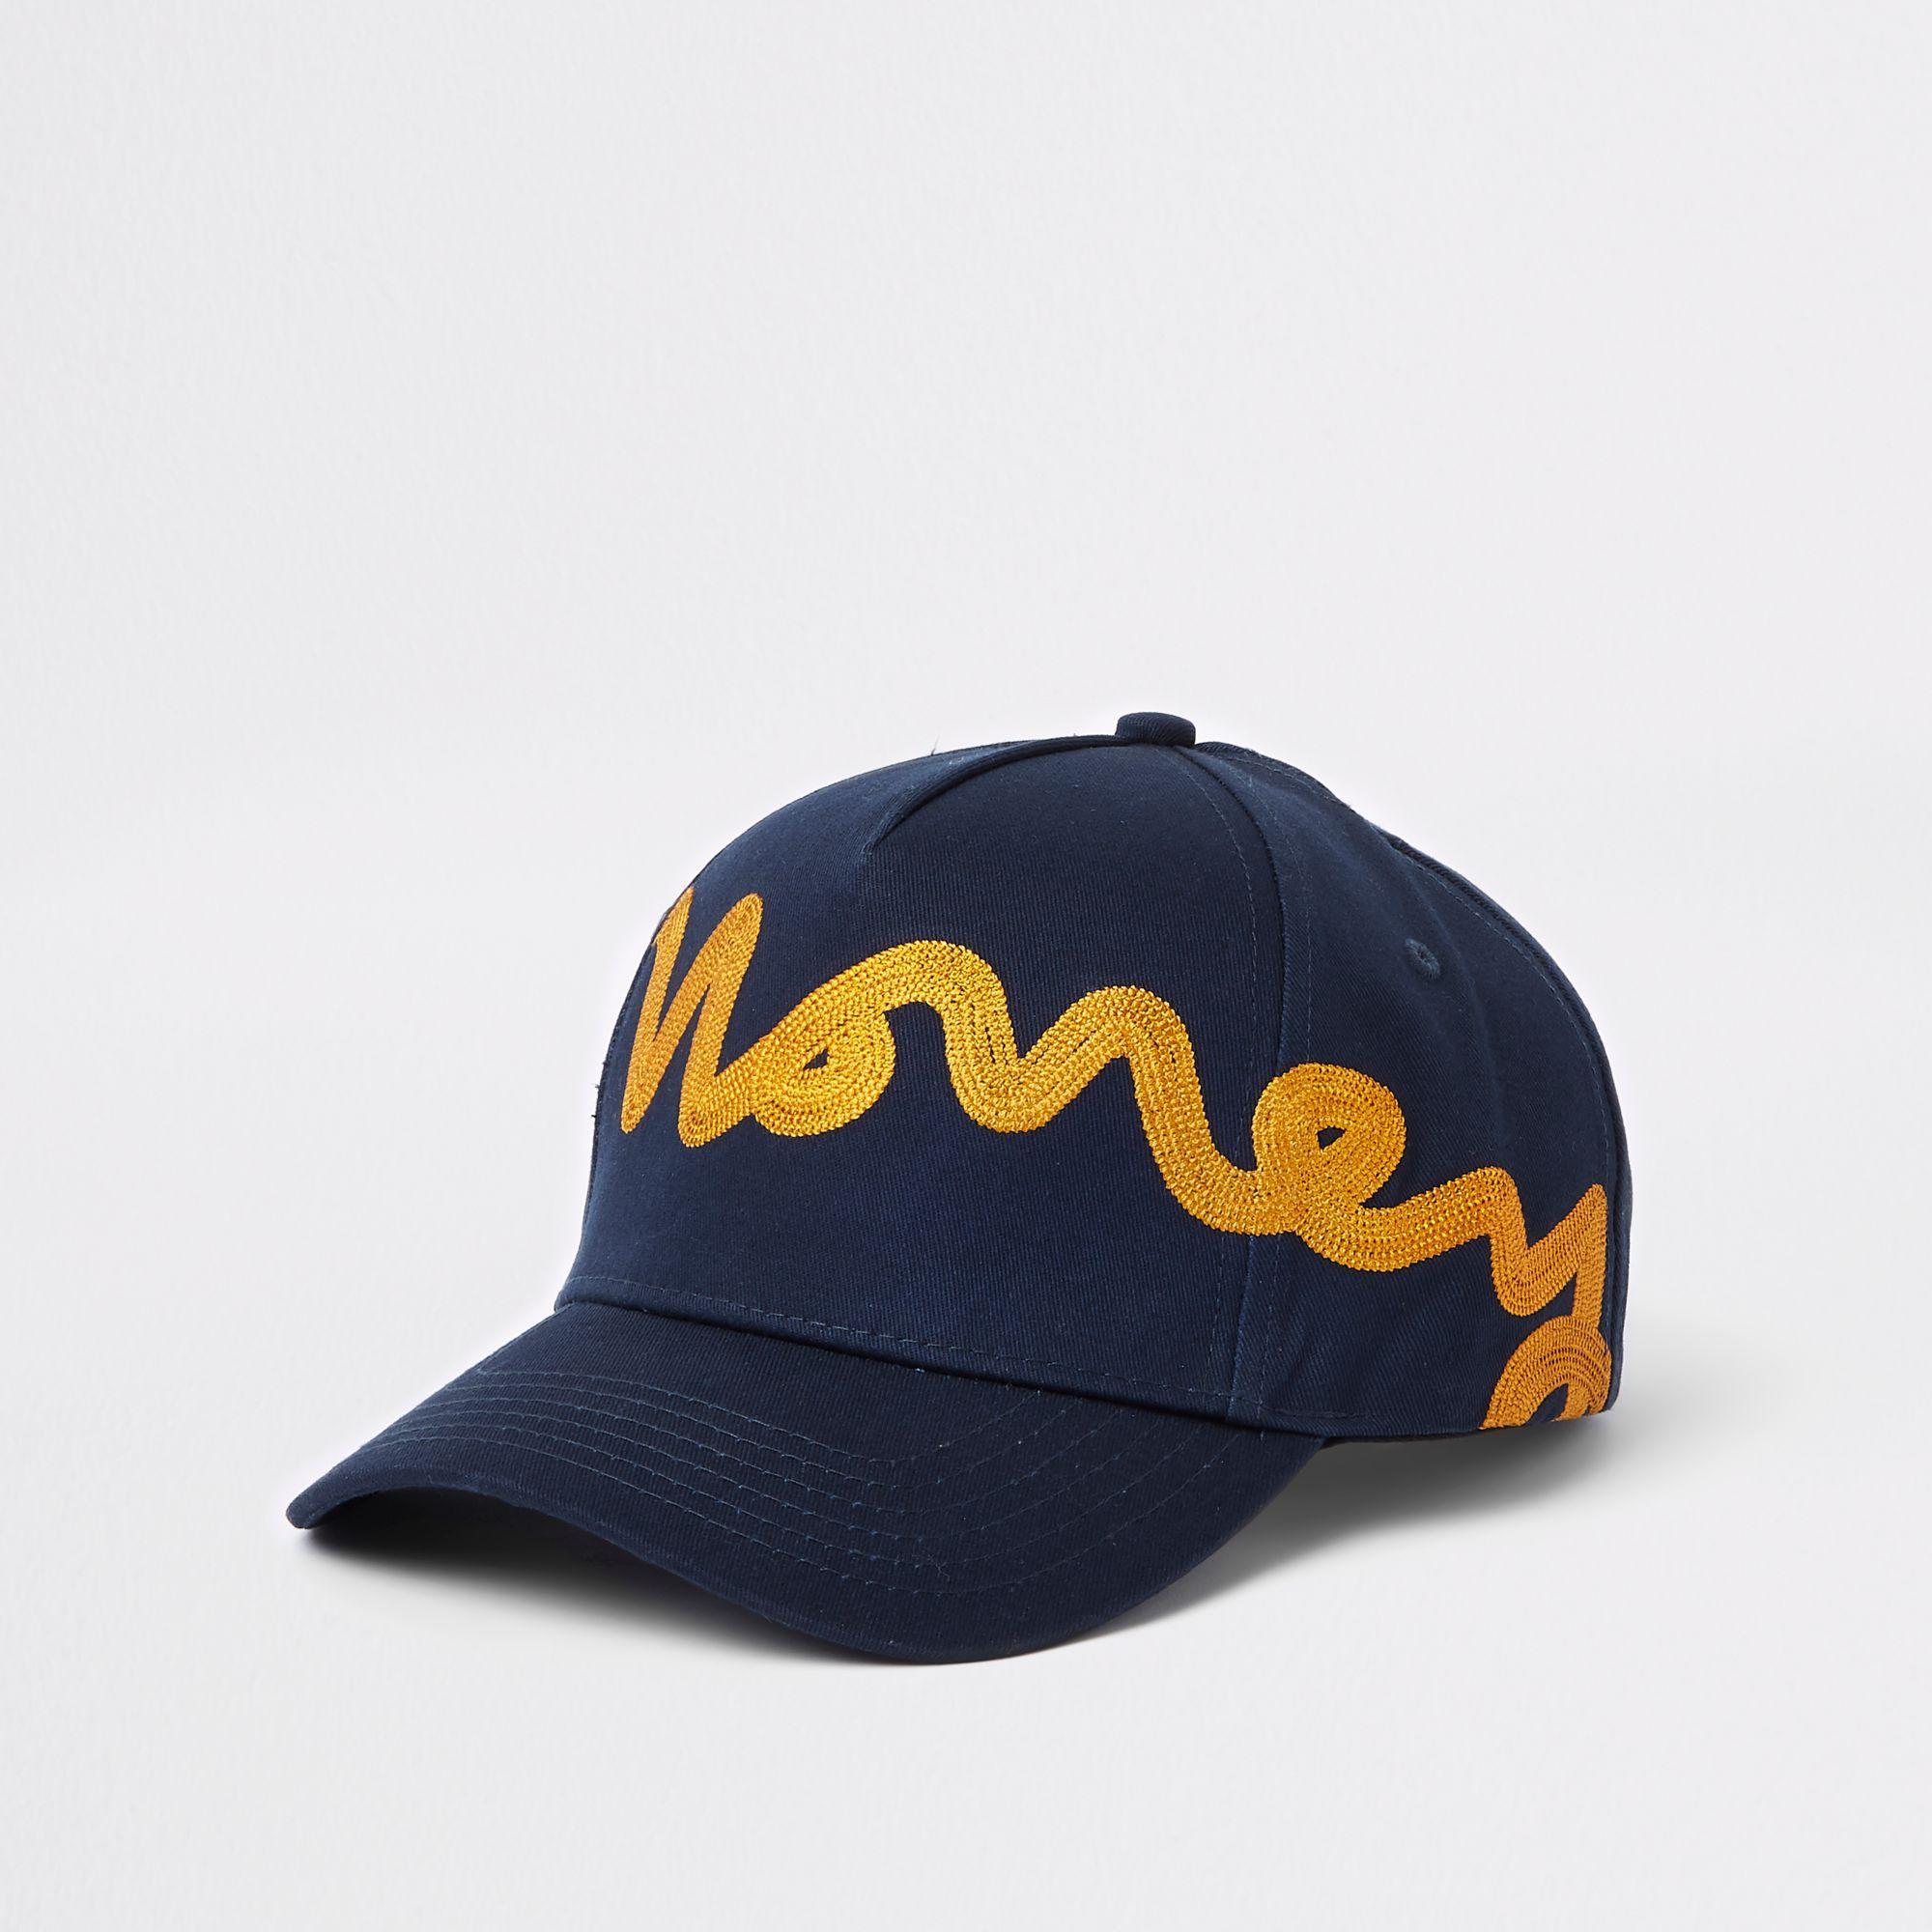 44c5214a River Island Money Clothing Navy Baseball Cap in Blue for Men - Lyst